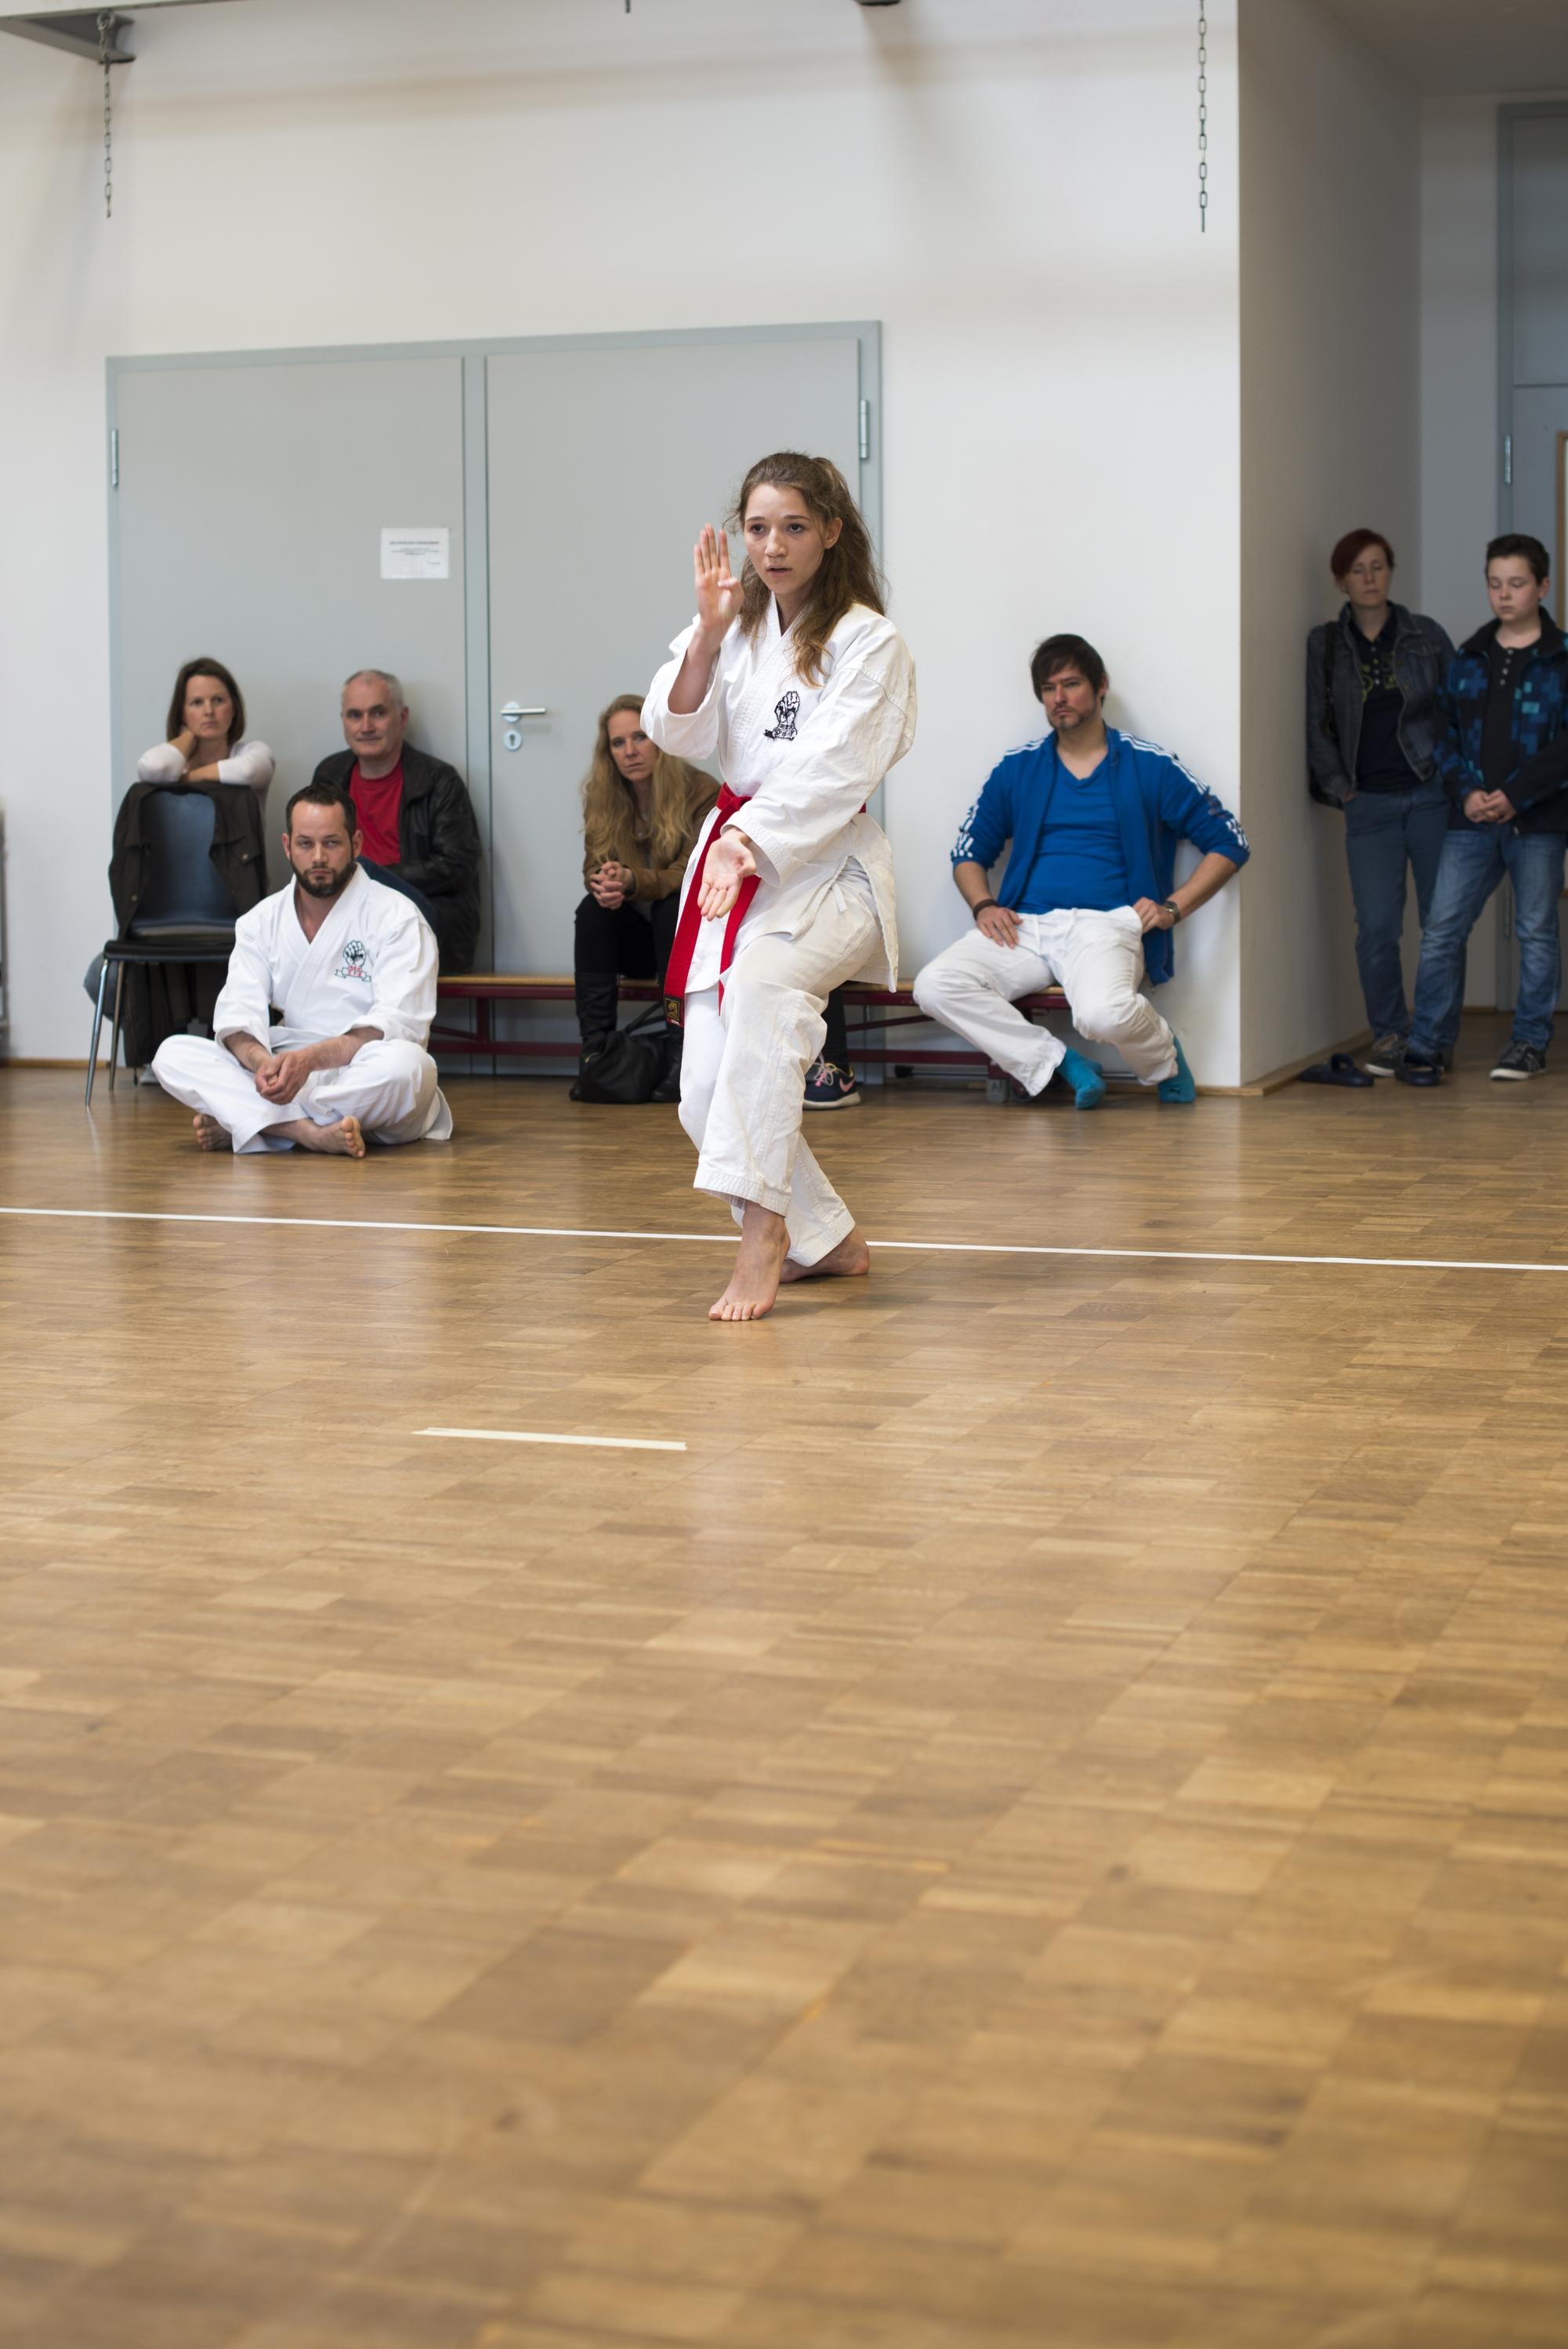 2016-04-26 Kata Turnier Kaarst 221